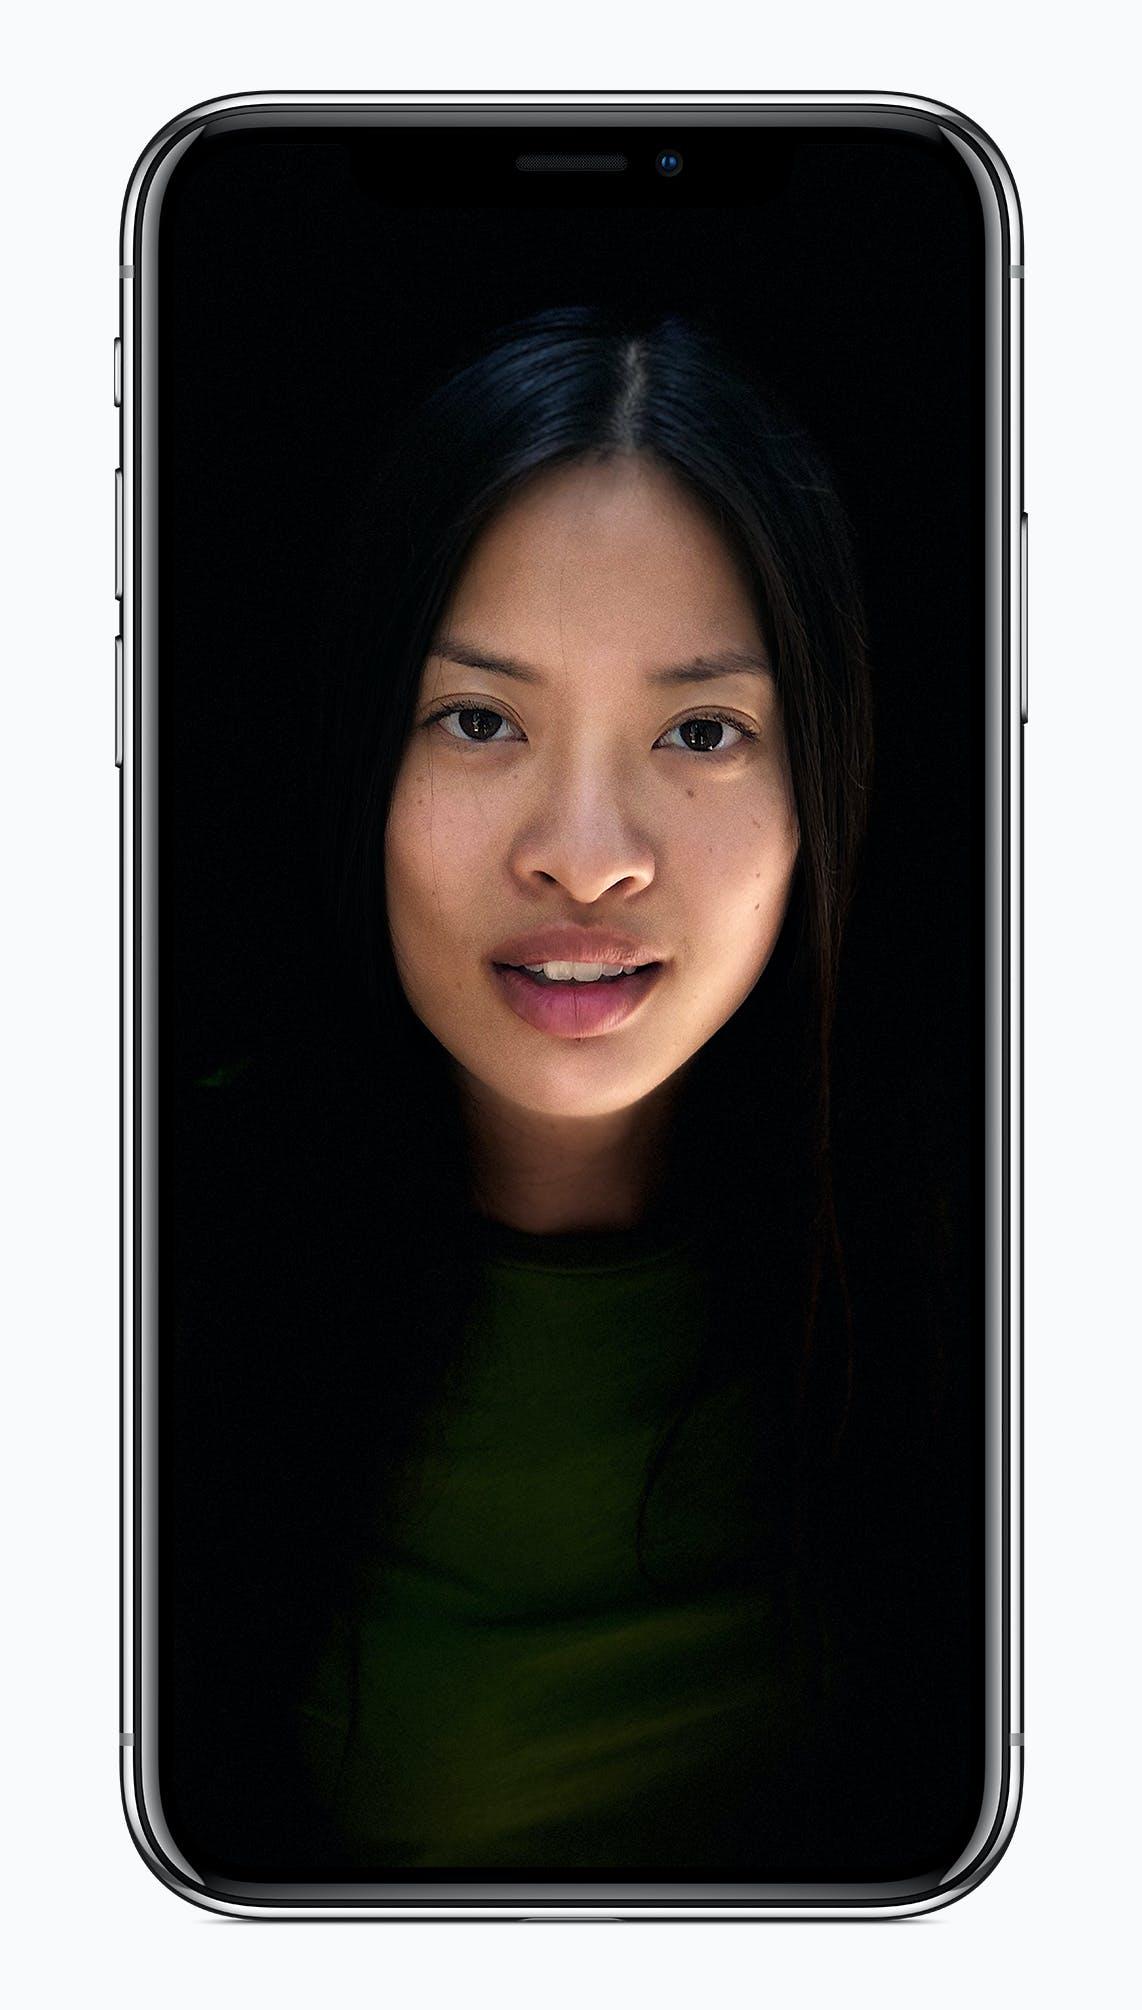 iOS, iPhone, iPhone X., 女孩 的 免費圖庫相片